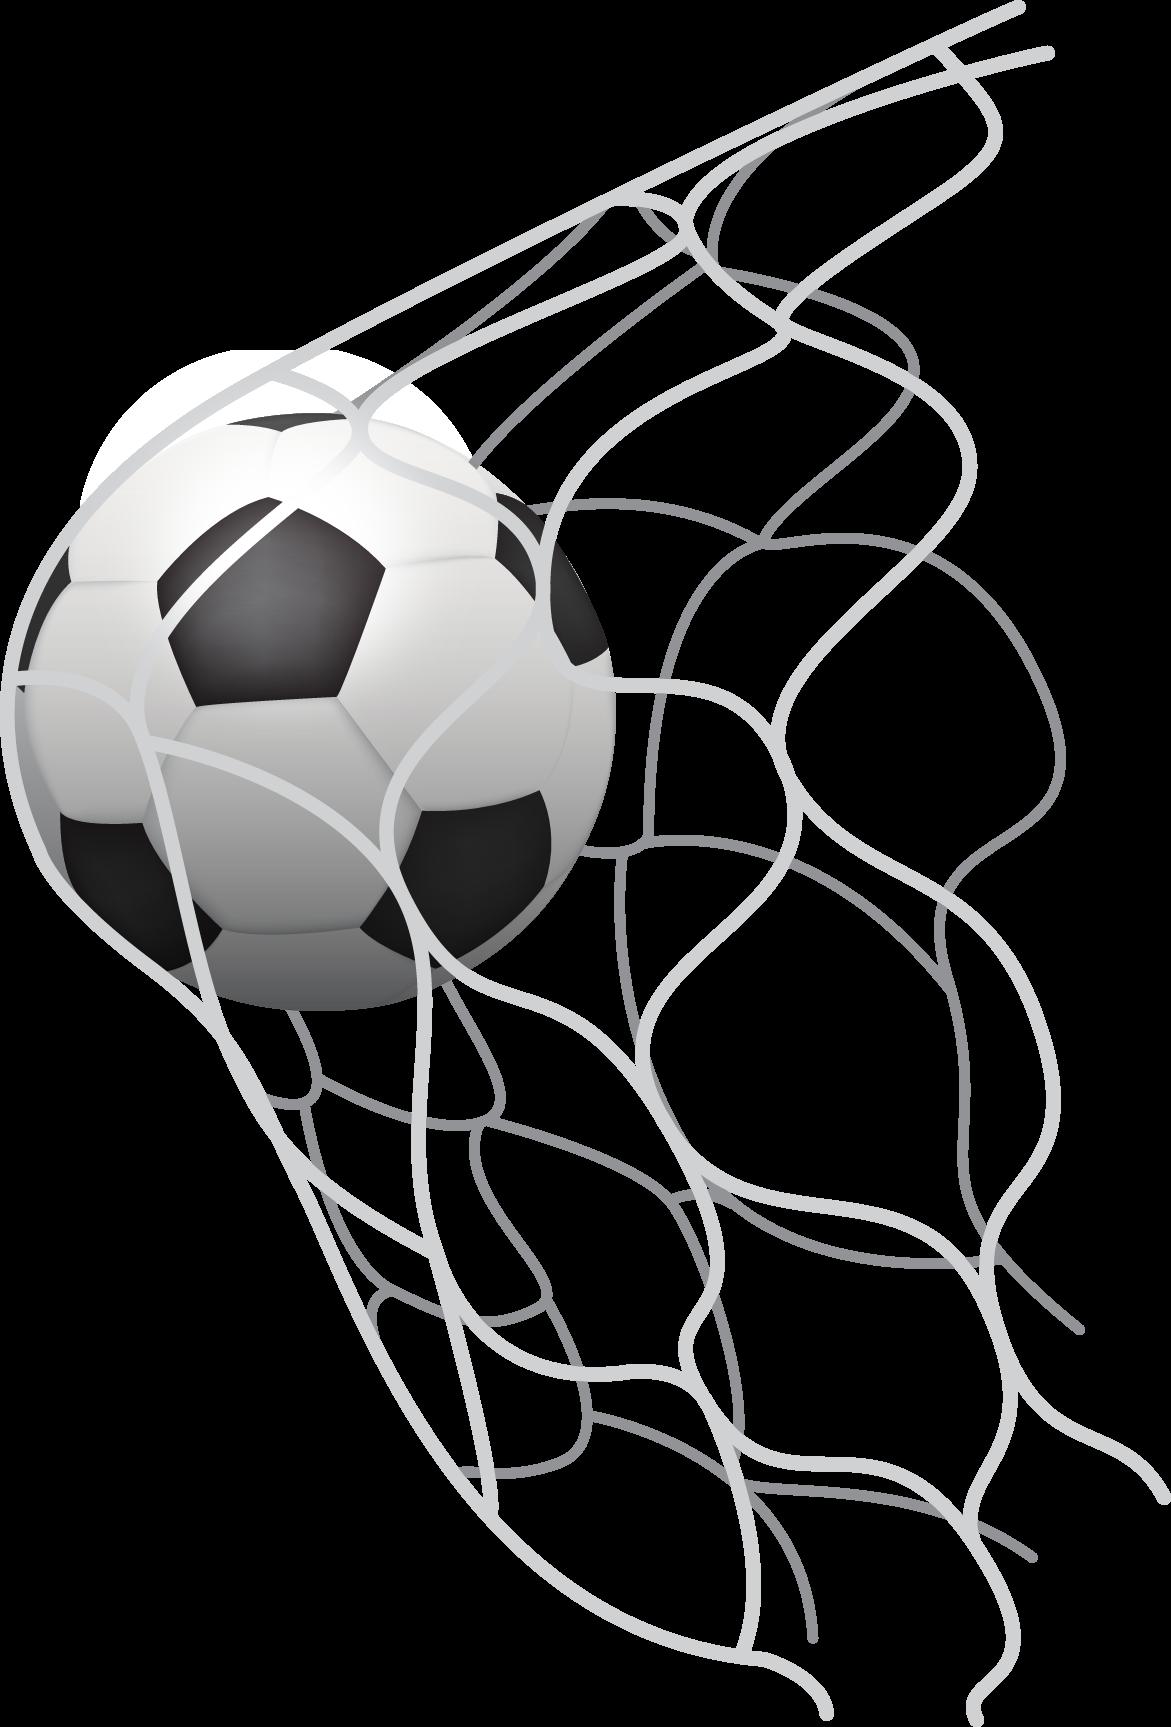 1171x1727 General Football Quiz Appslab Entertainment